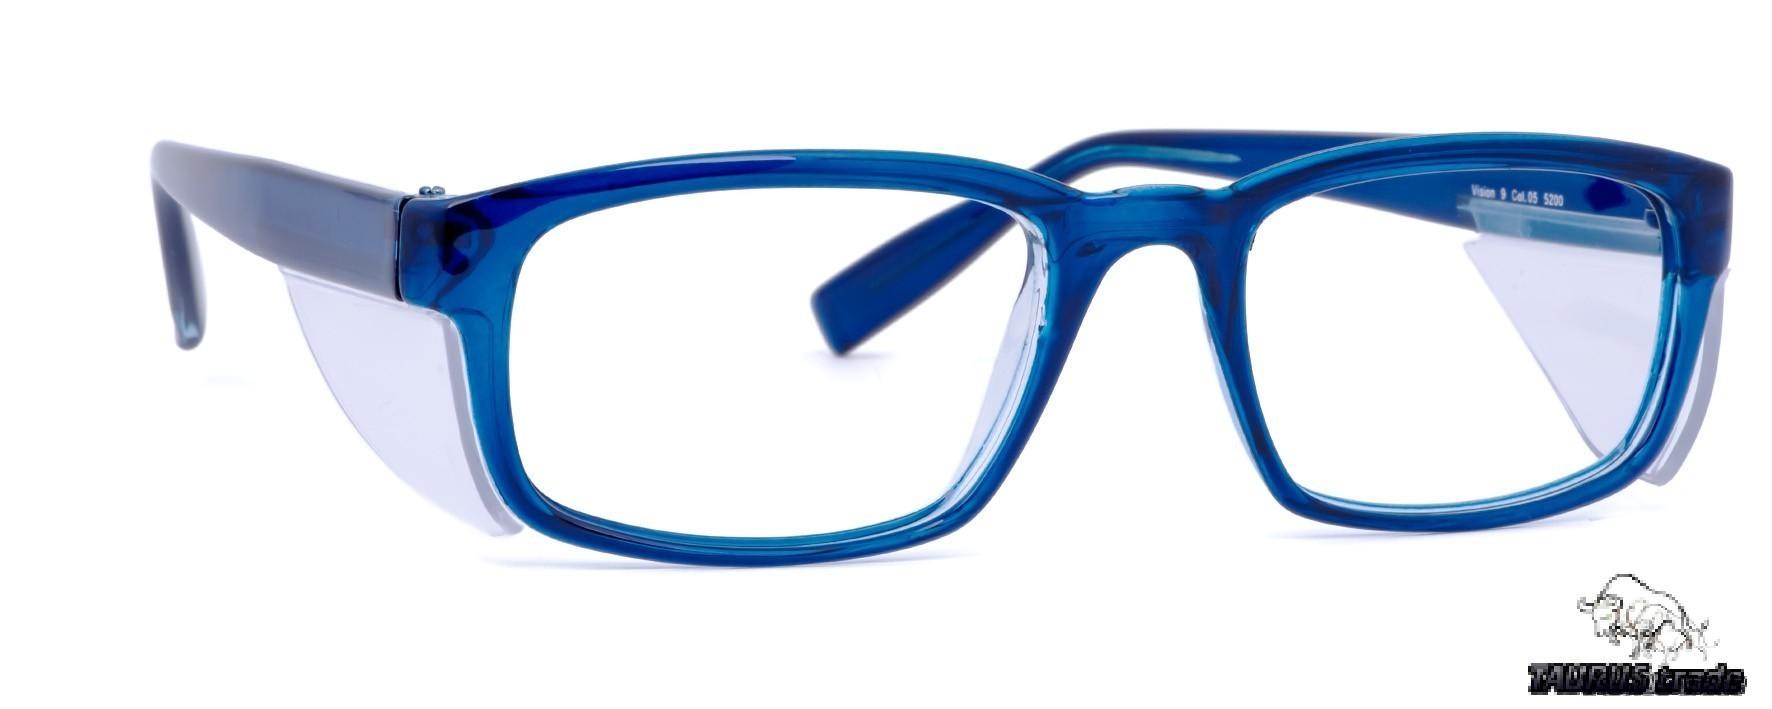 2095-05-5216-VISION-9-blau